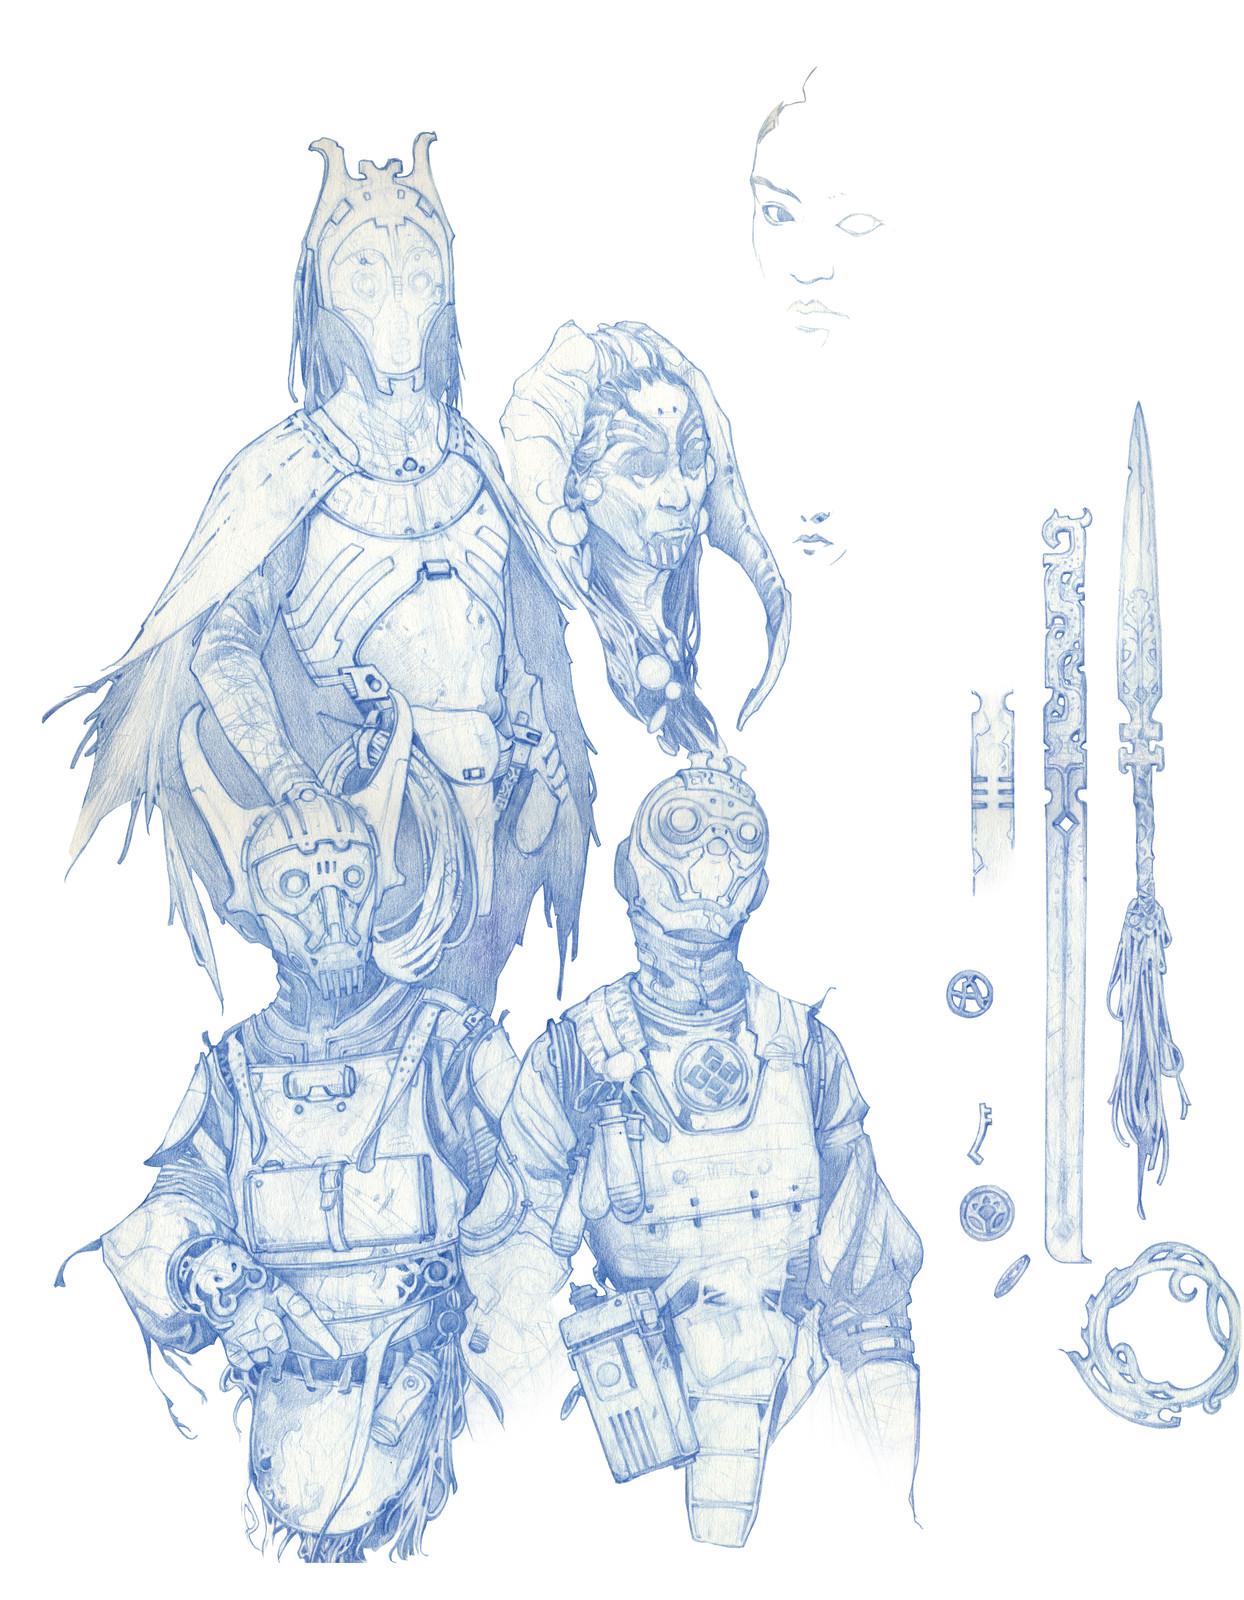 Sketch book page